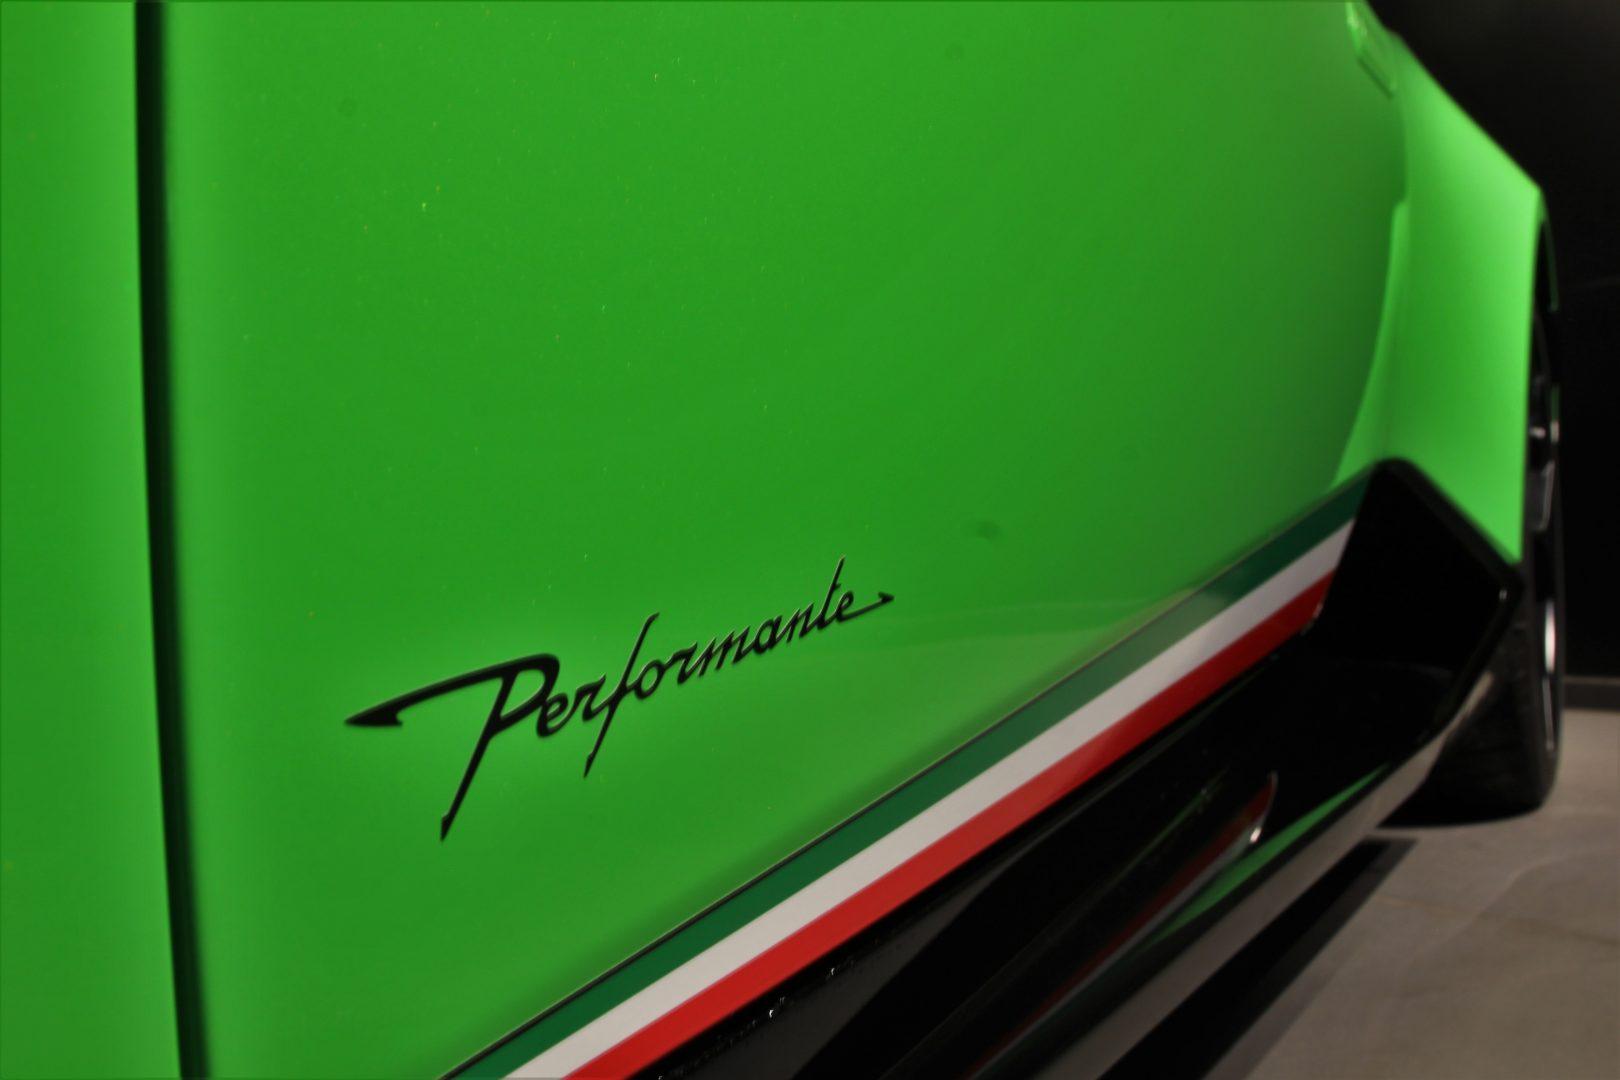 AIL Lamborghini Huracan Performante Spyder LP 640-4 Verda Mantis 7